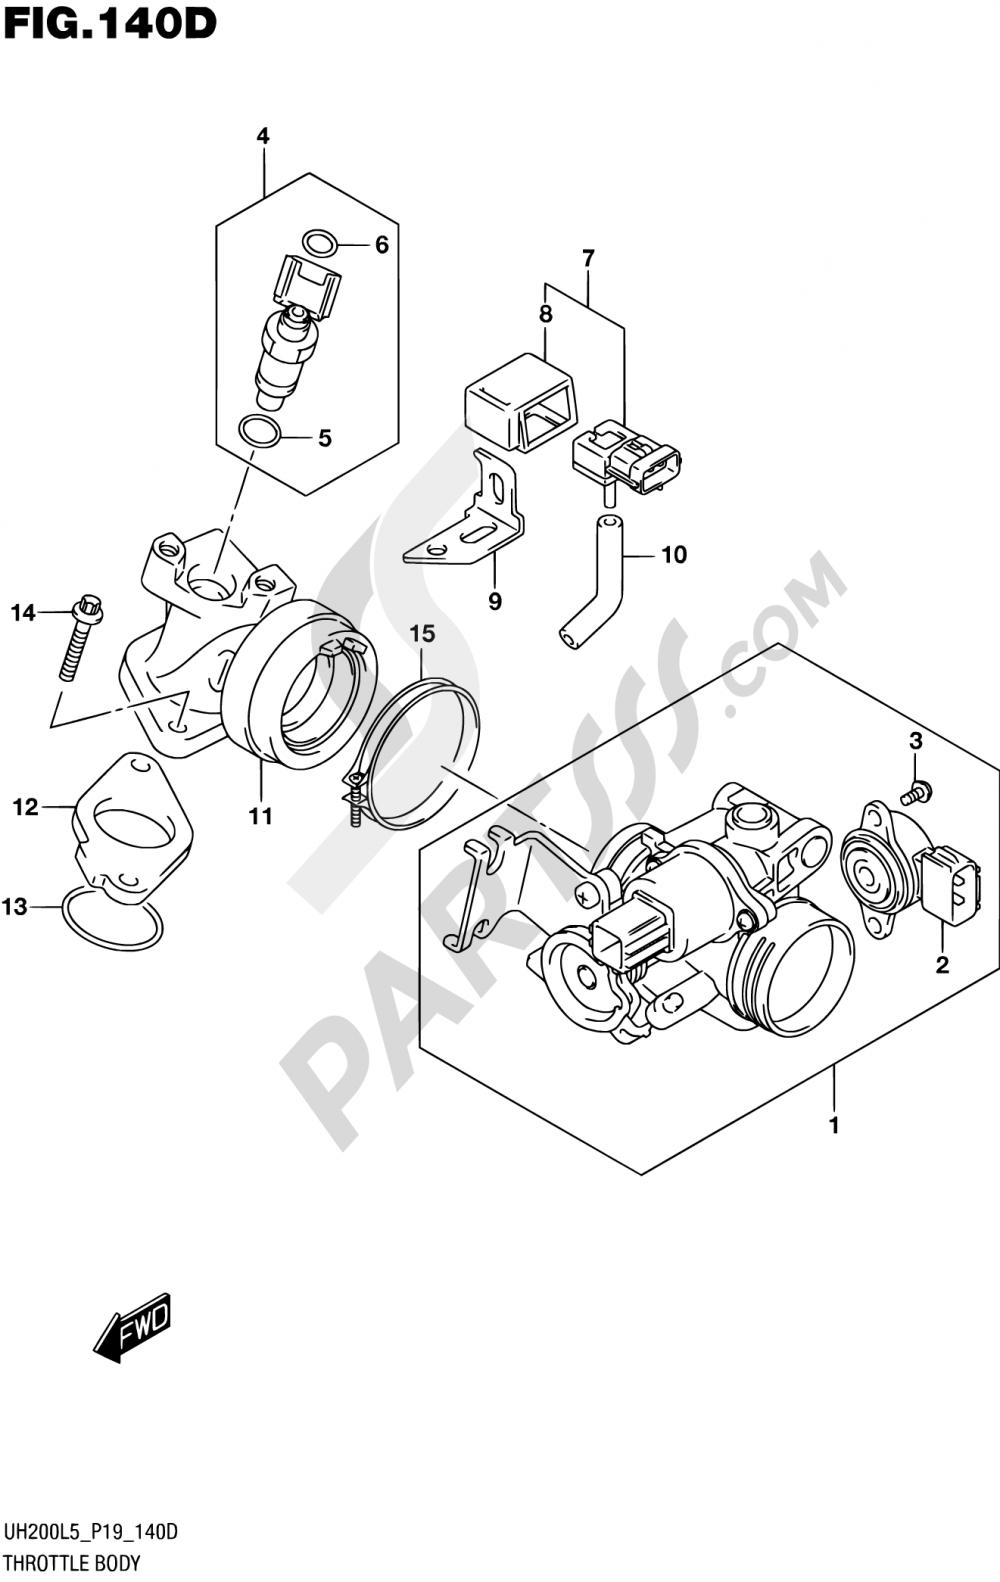 140D - THROTTLE BODY (UH200L5 P53) Suzuki BURGMAN UH200A 2015